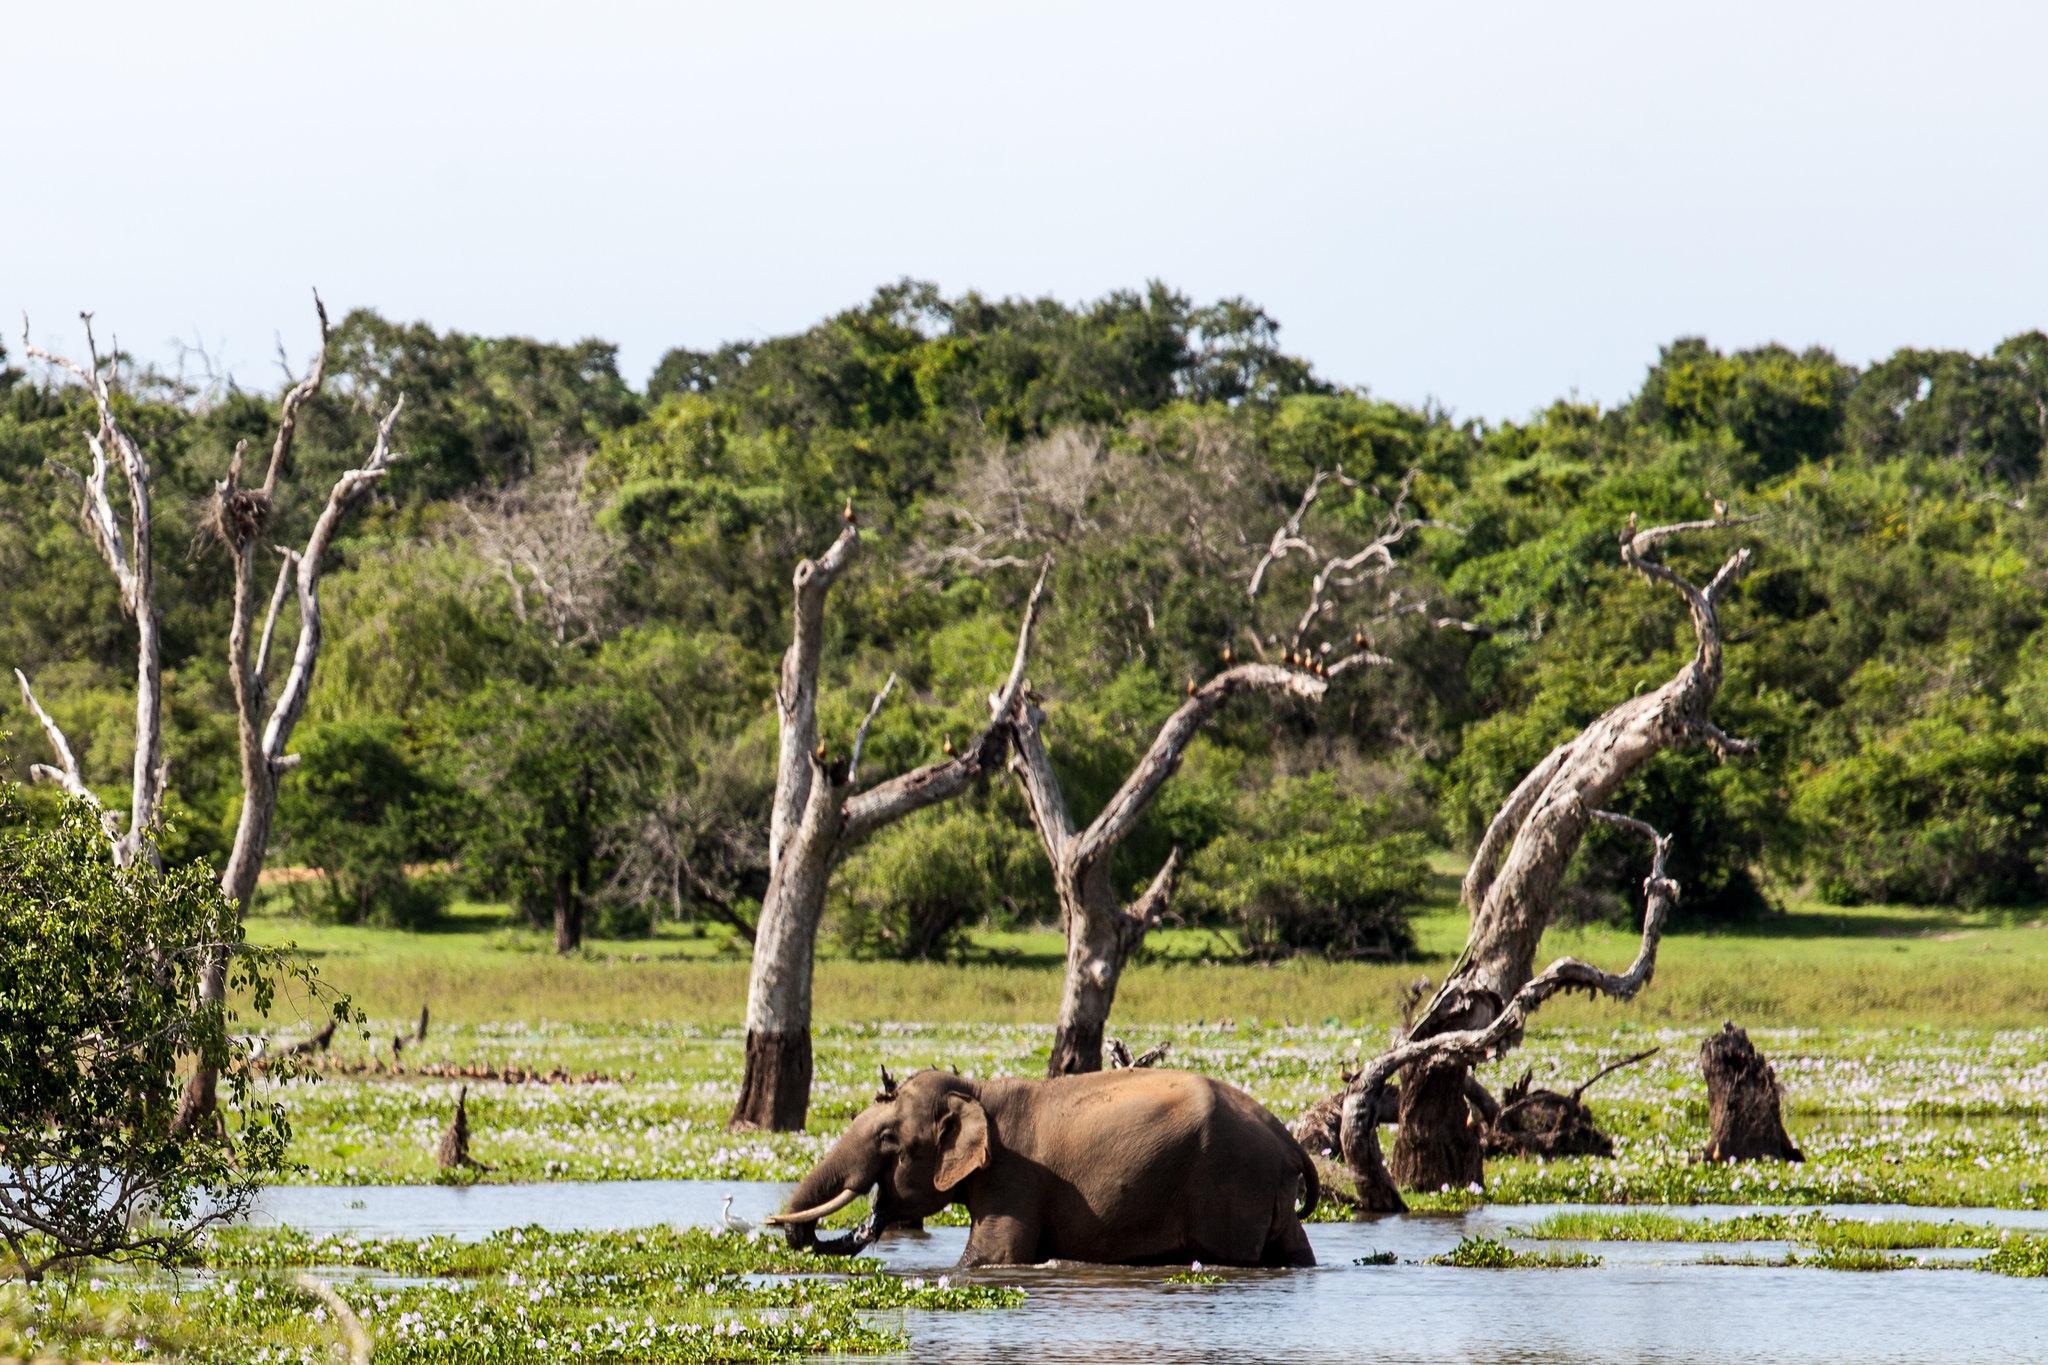 Asia's Wildlife Hotspot-Reason to Visit Sri Lanka Will Amaze You